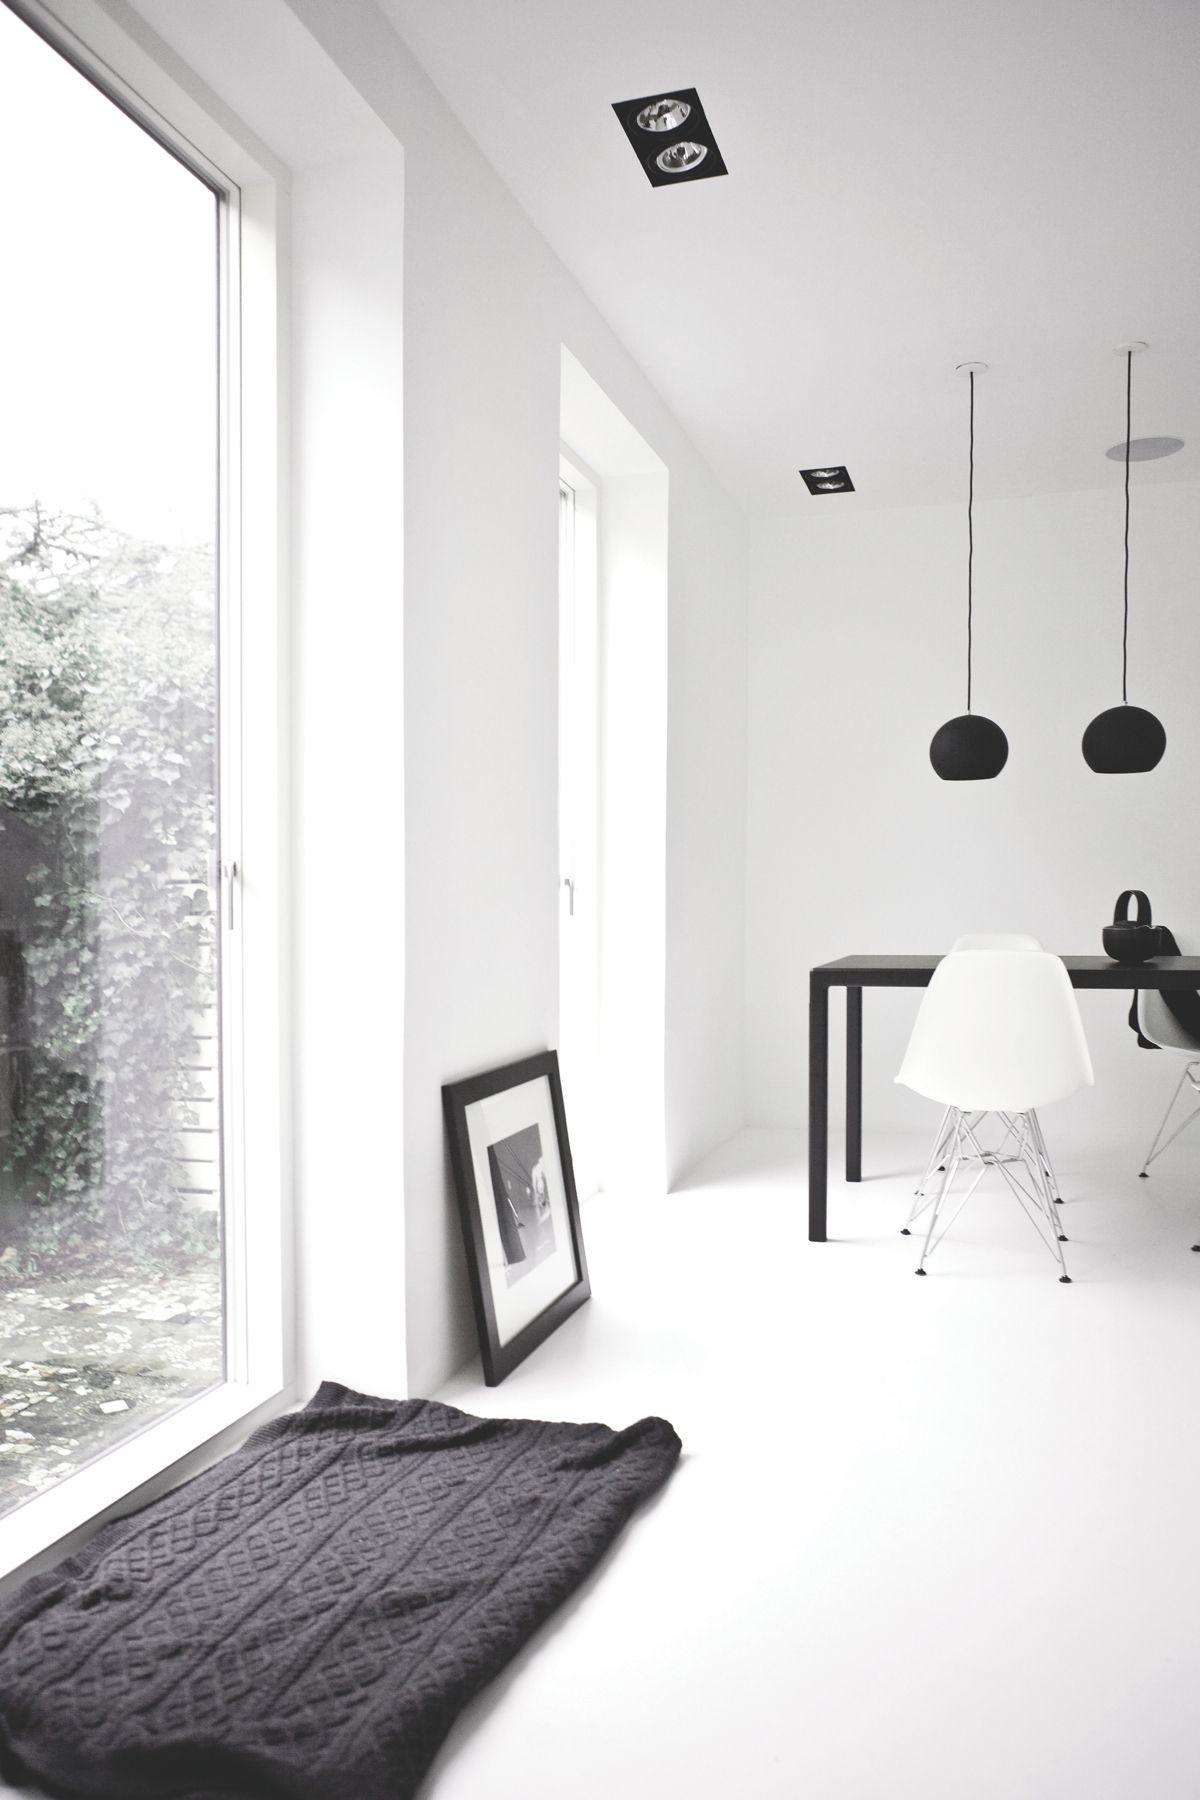 Copenhagen townhouse minimalissimo nordic interior minimalist interior scandinavian interiors scandinavian style